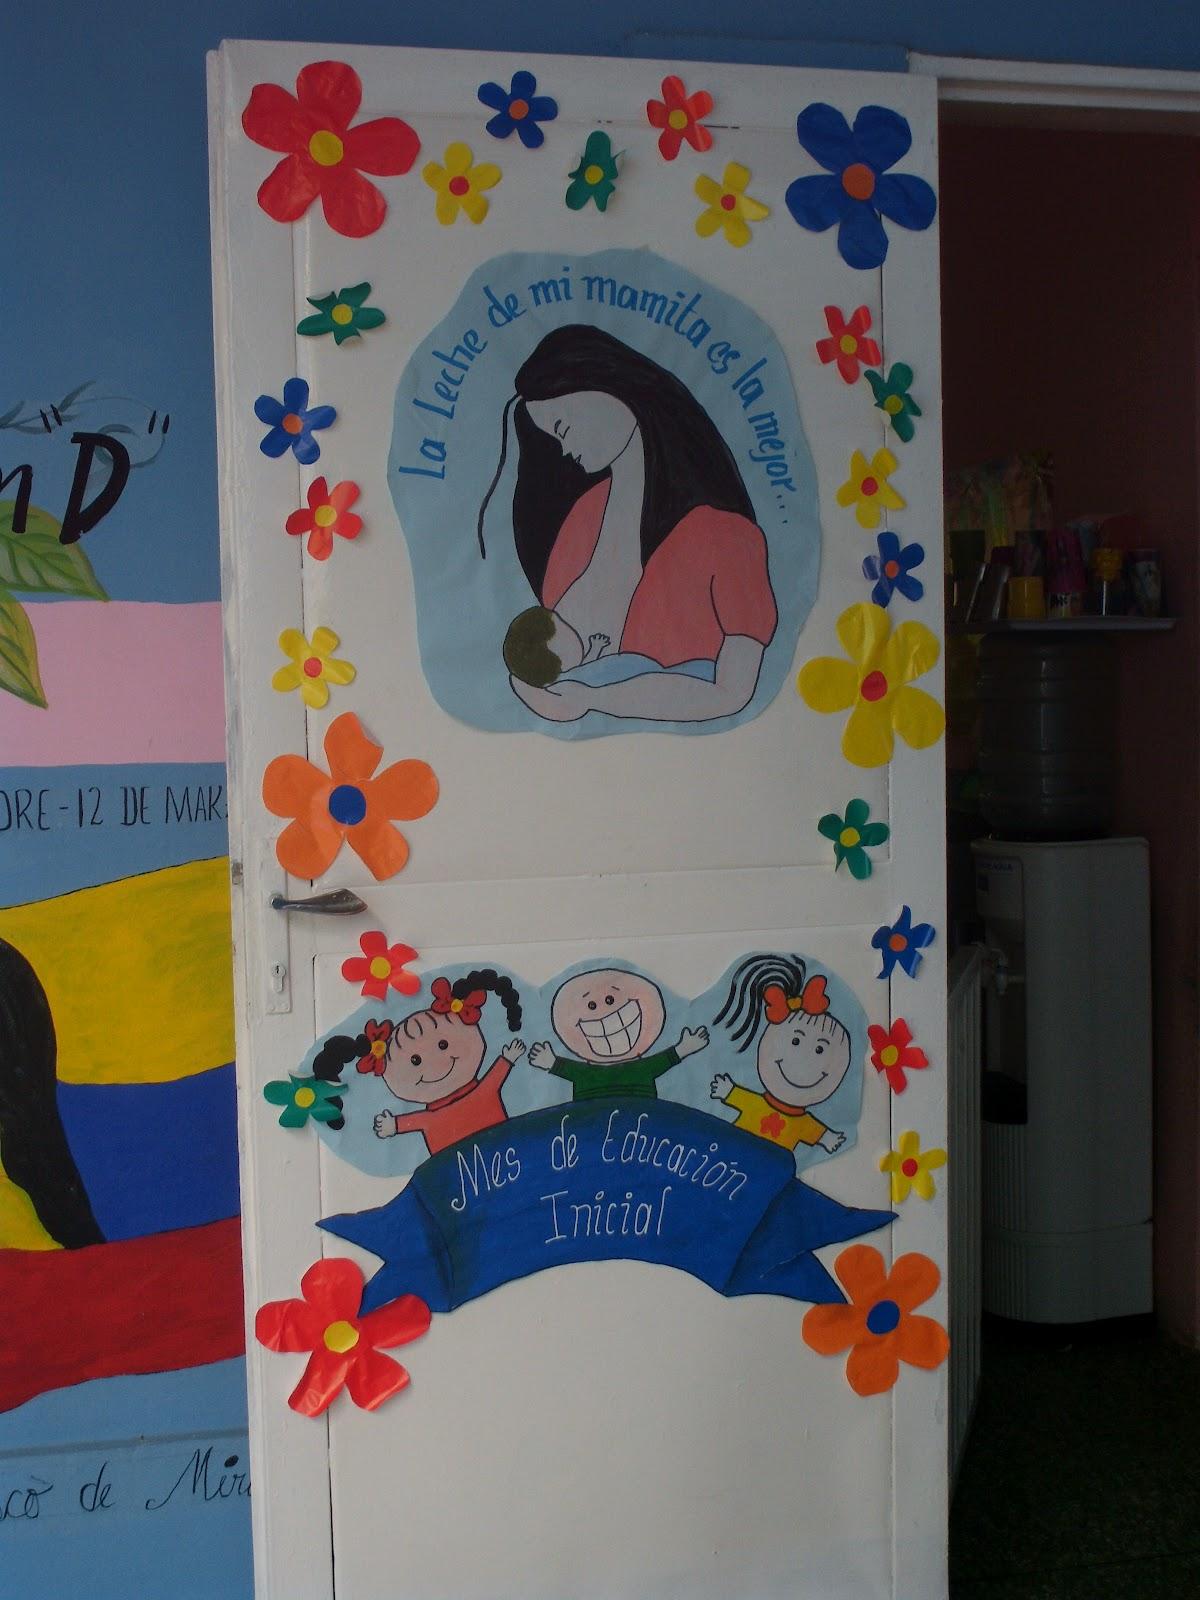 Cajitas de sue os puertas decoradas del simoncito for Puertas decoradas para guarderia